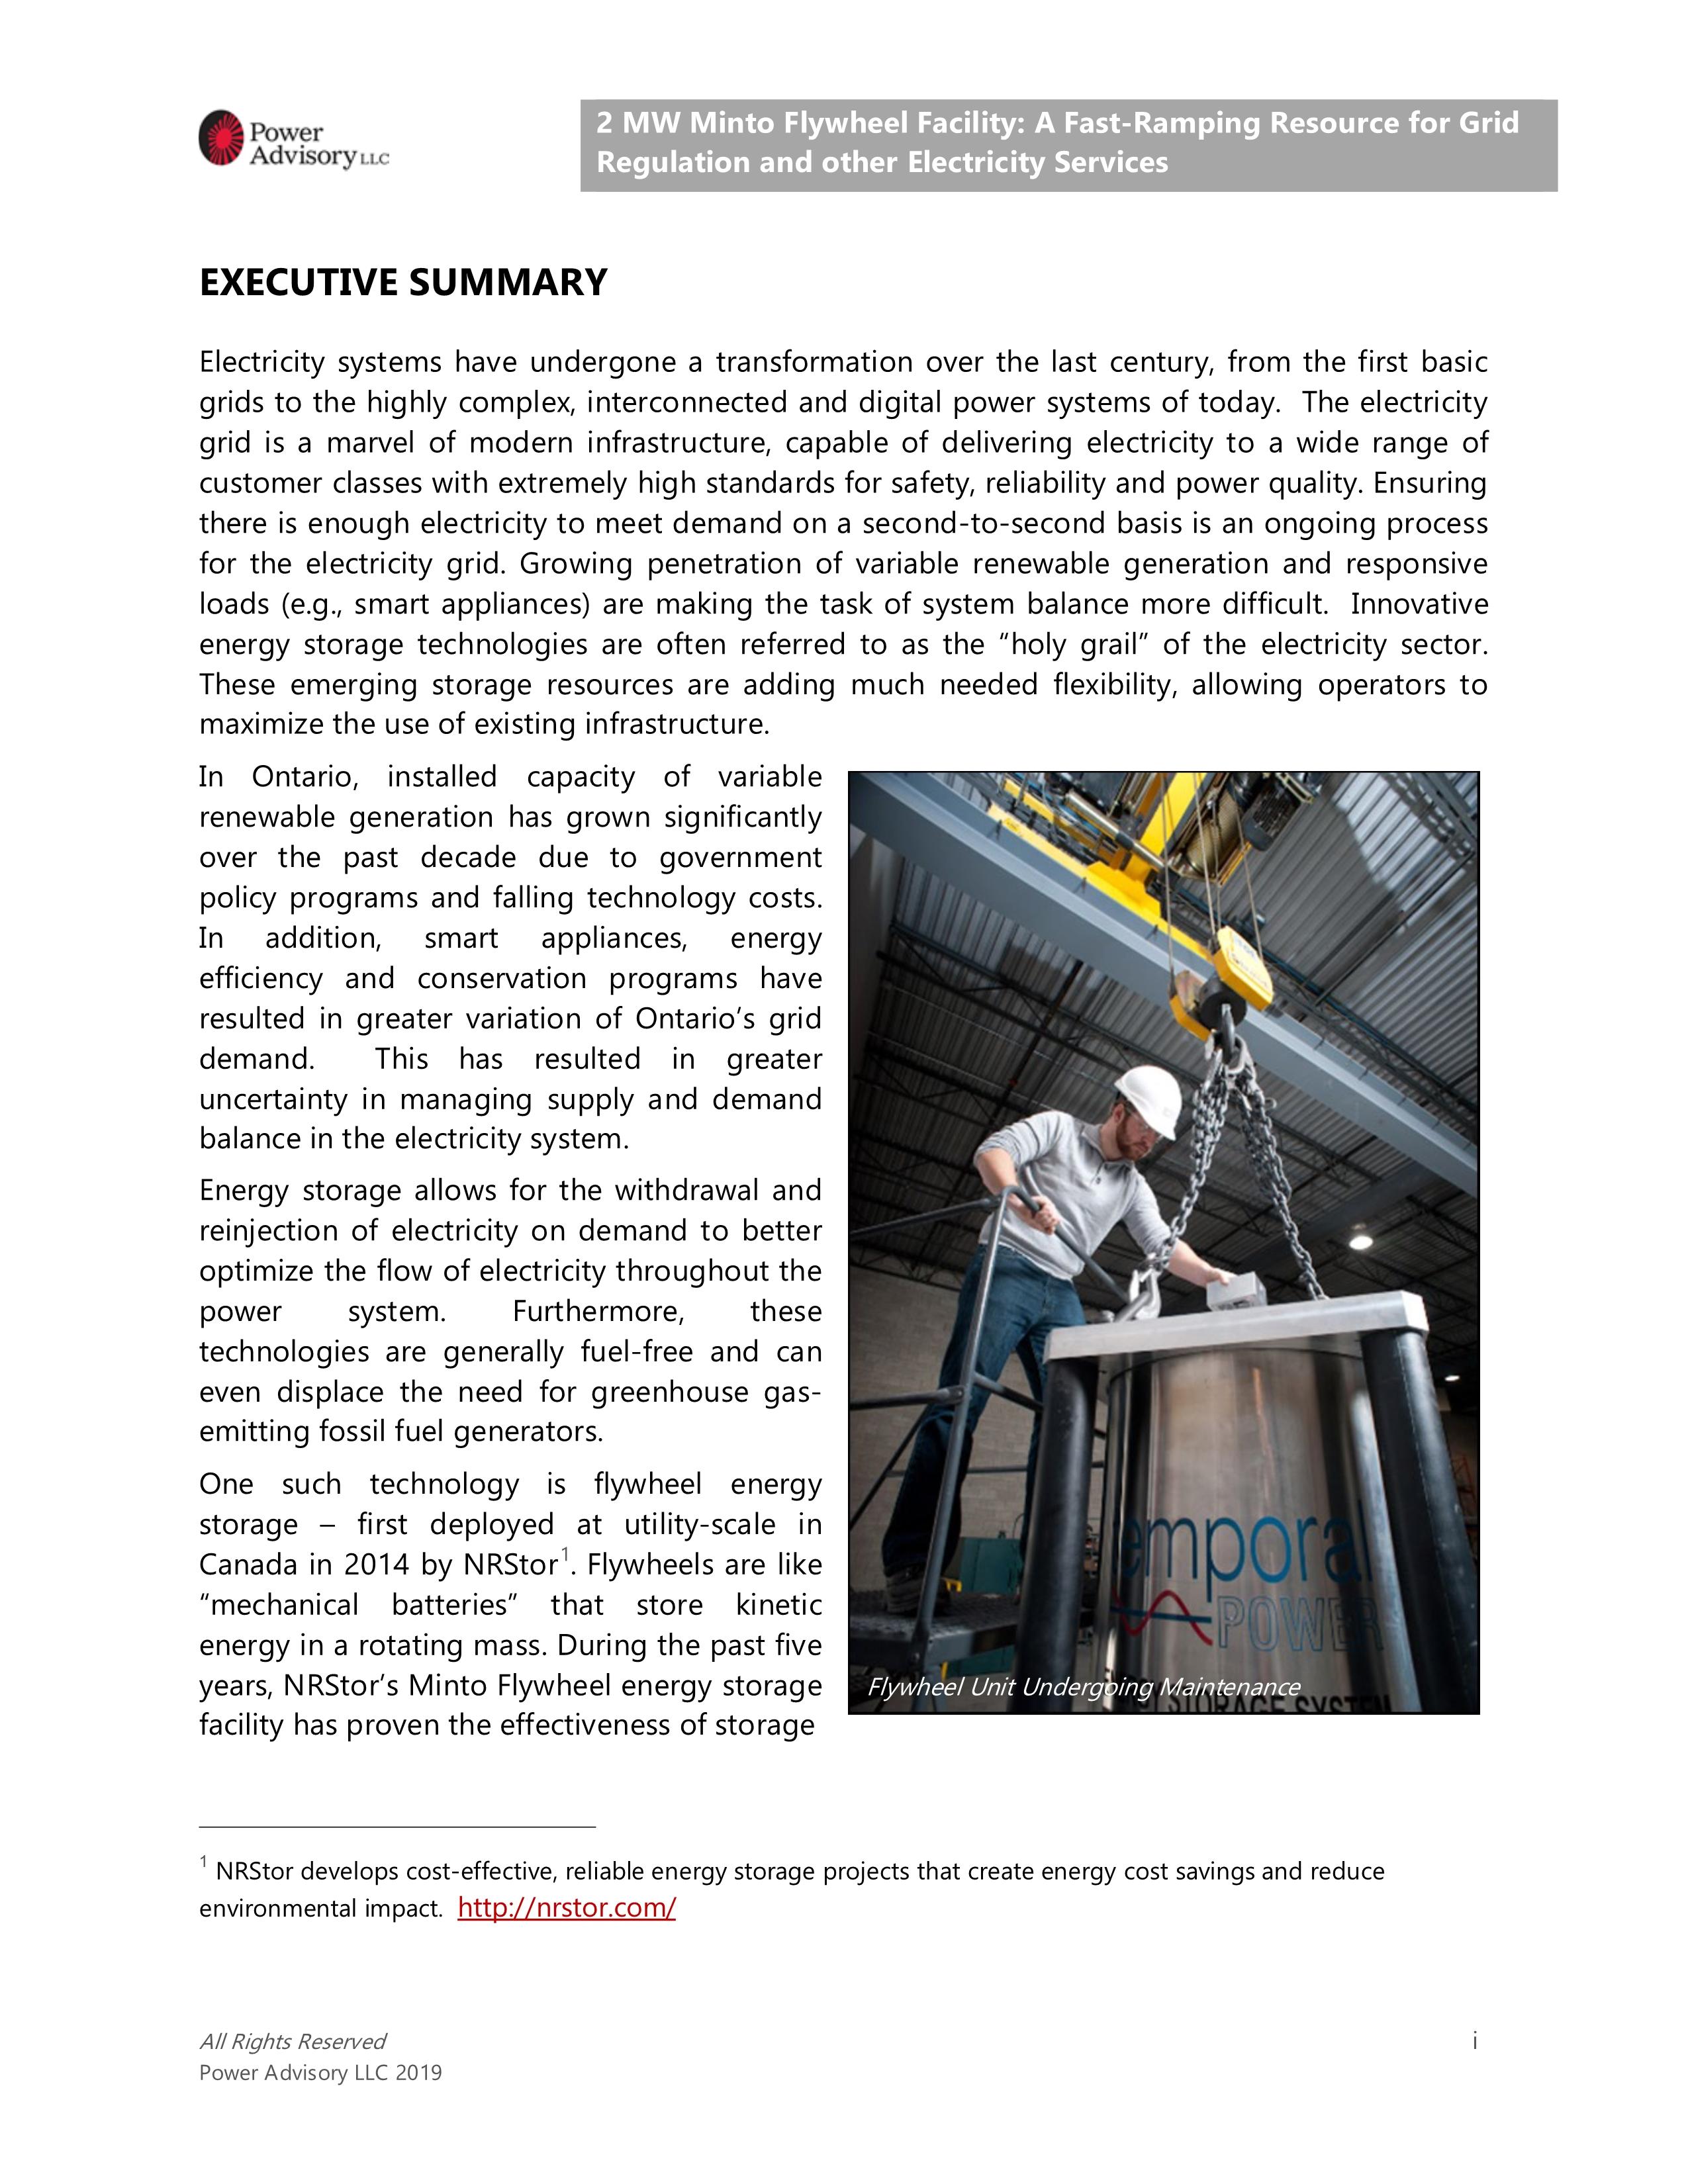 2-MW-Minto-Flywheel-Facility-Case-Study_2.jpg